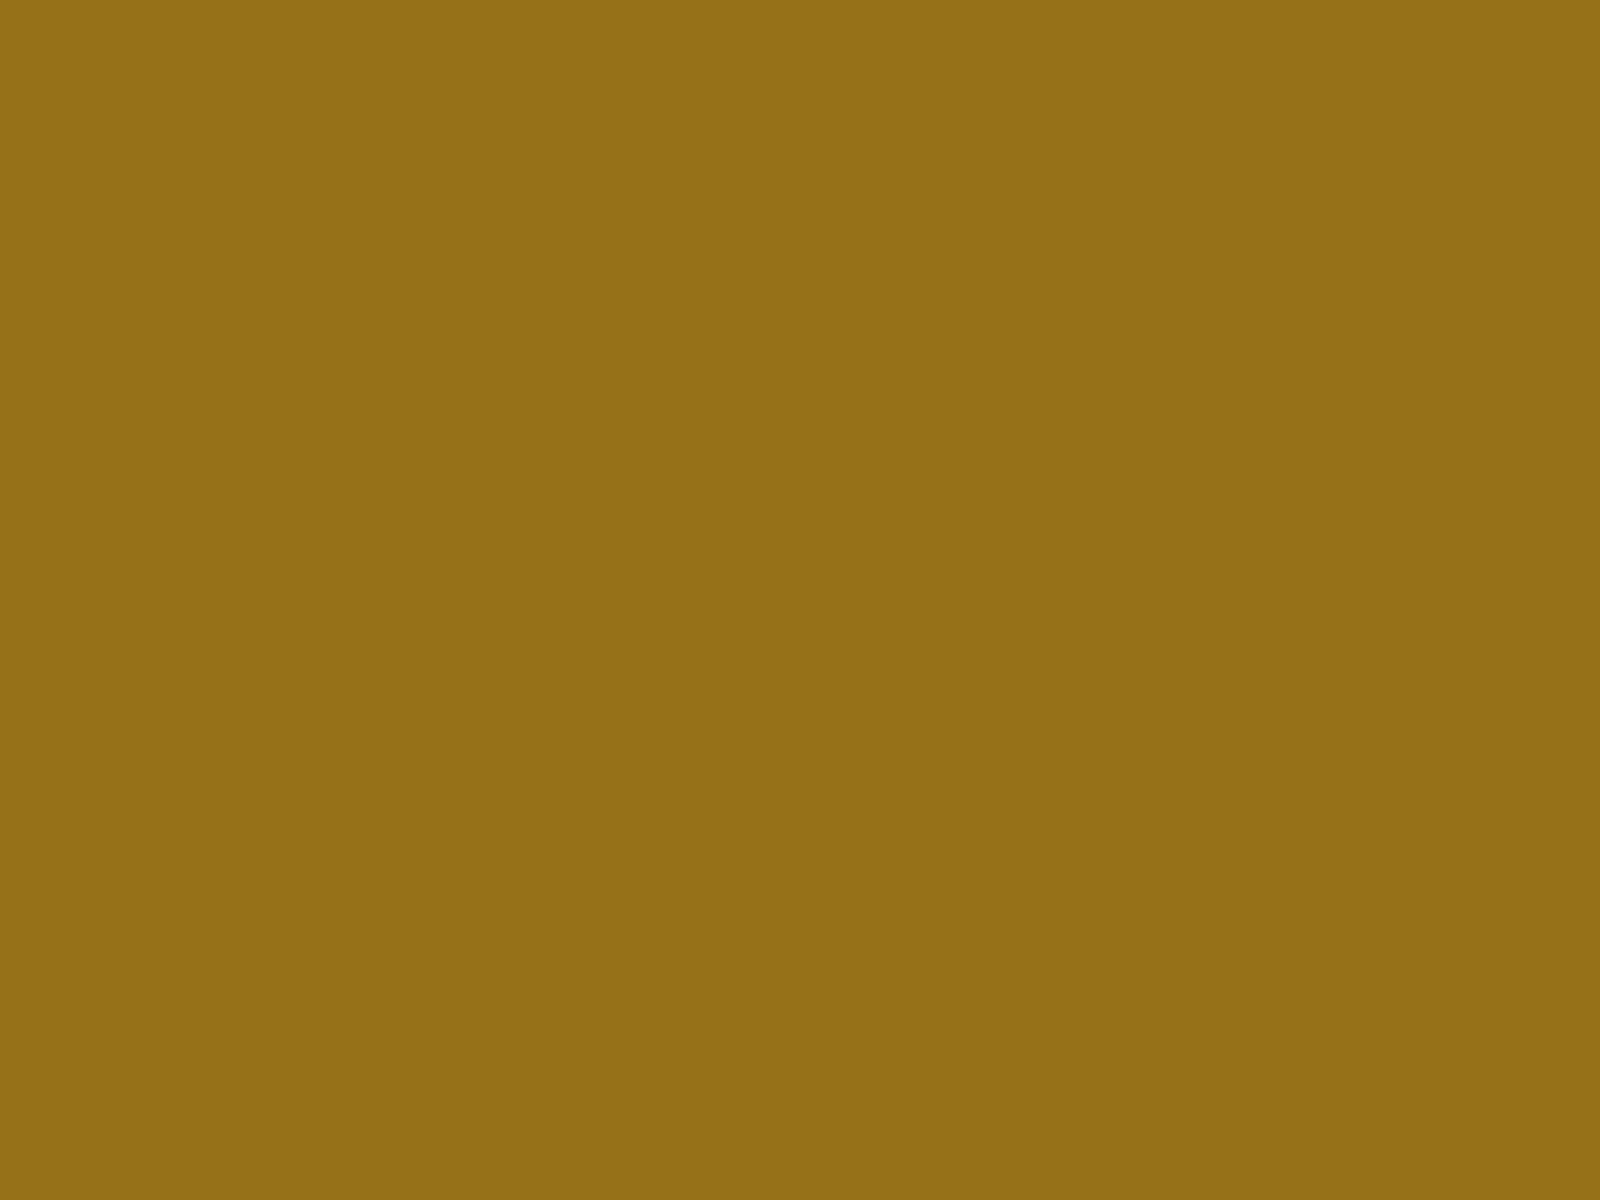 1600x1200 Bistre Brown Solid Color Background